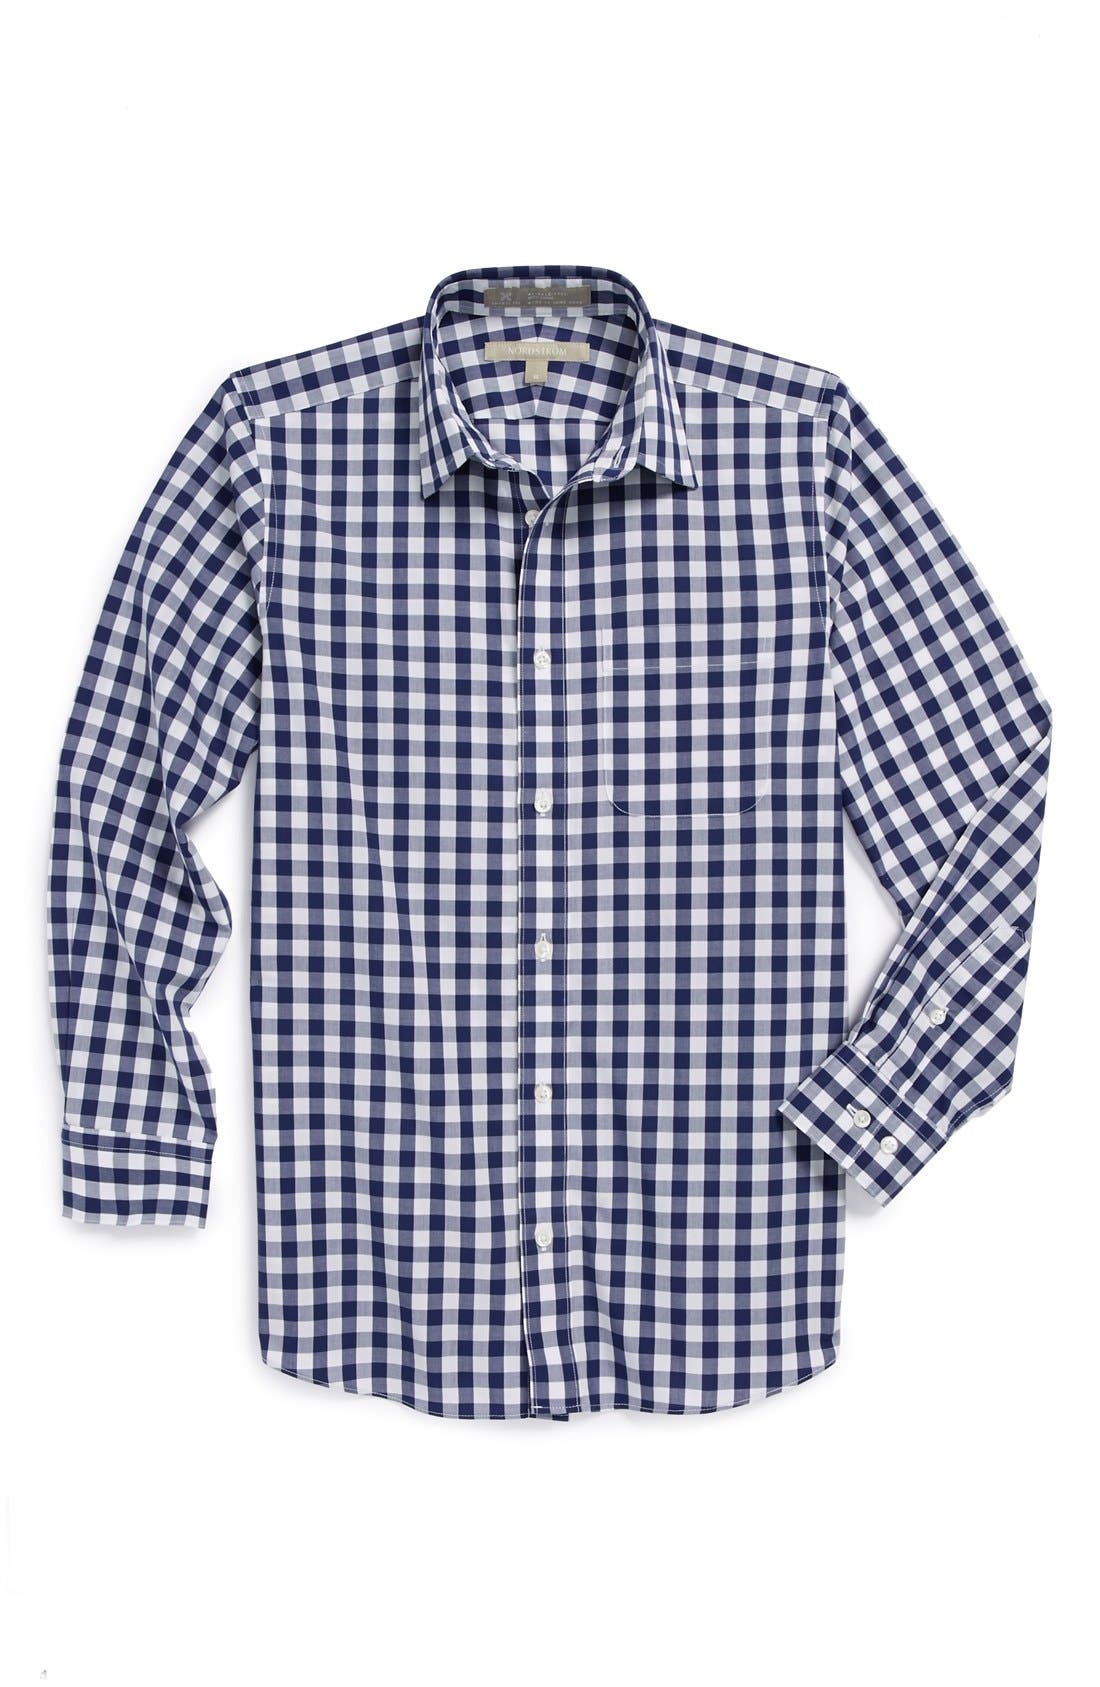 Main Image - Nordstrom Smartcare™ Dress Shirt (Big Boys)